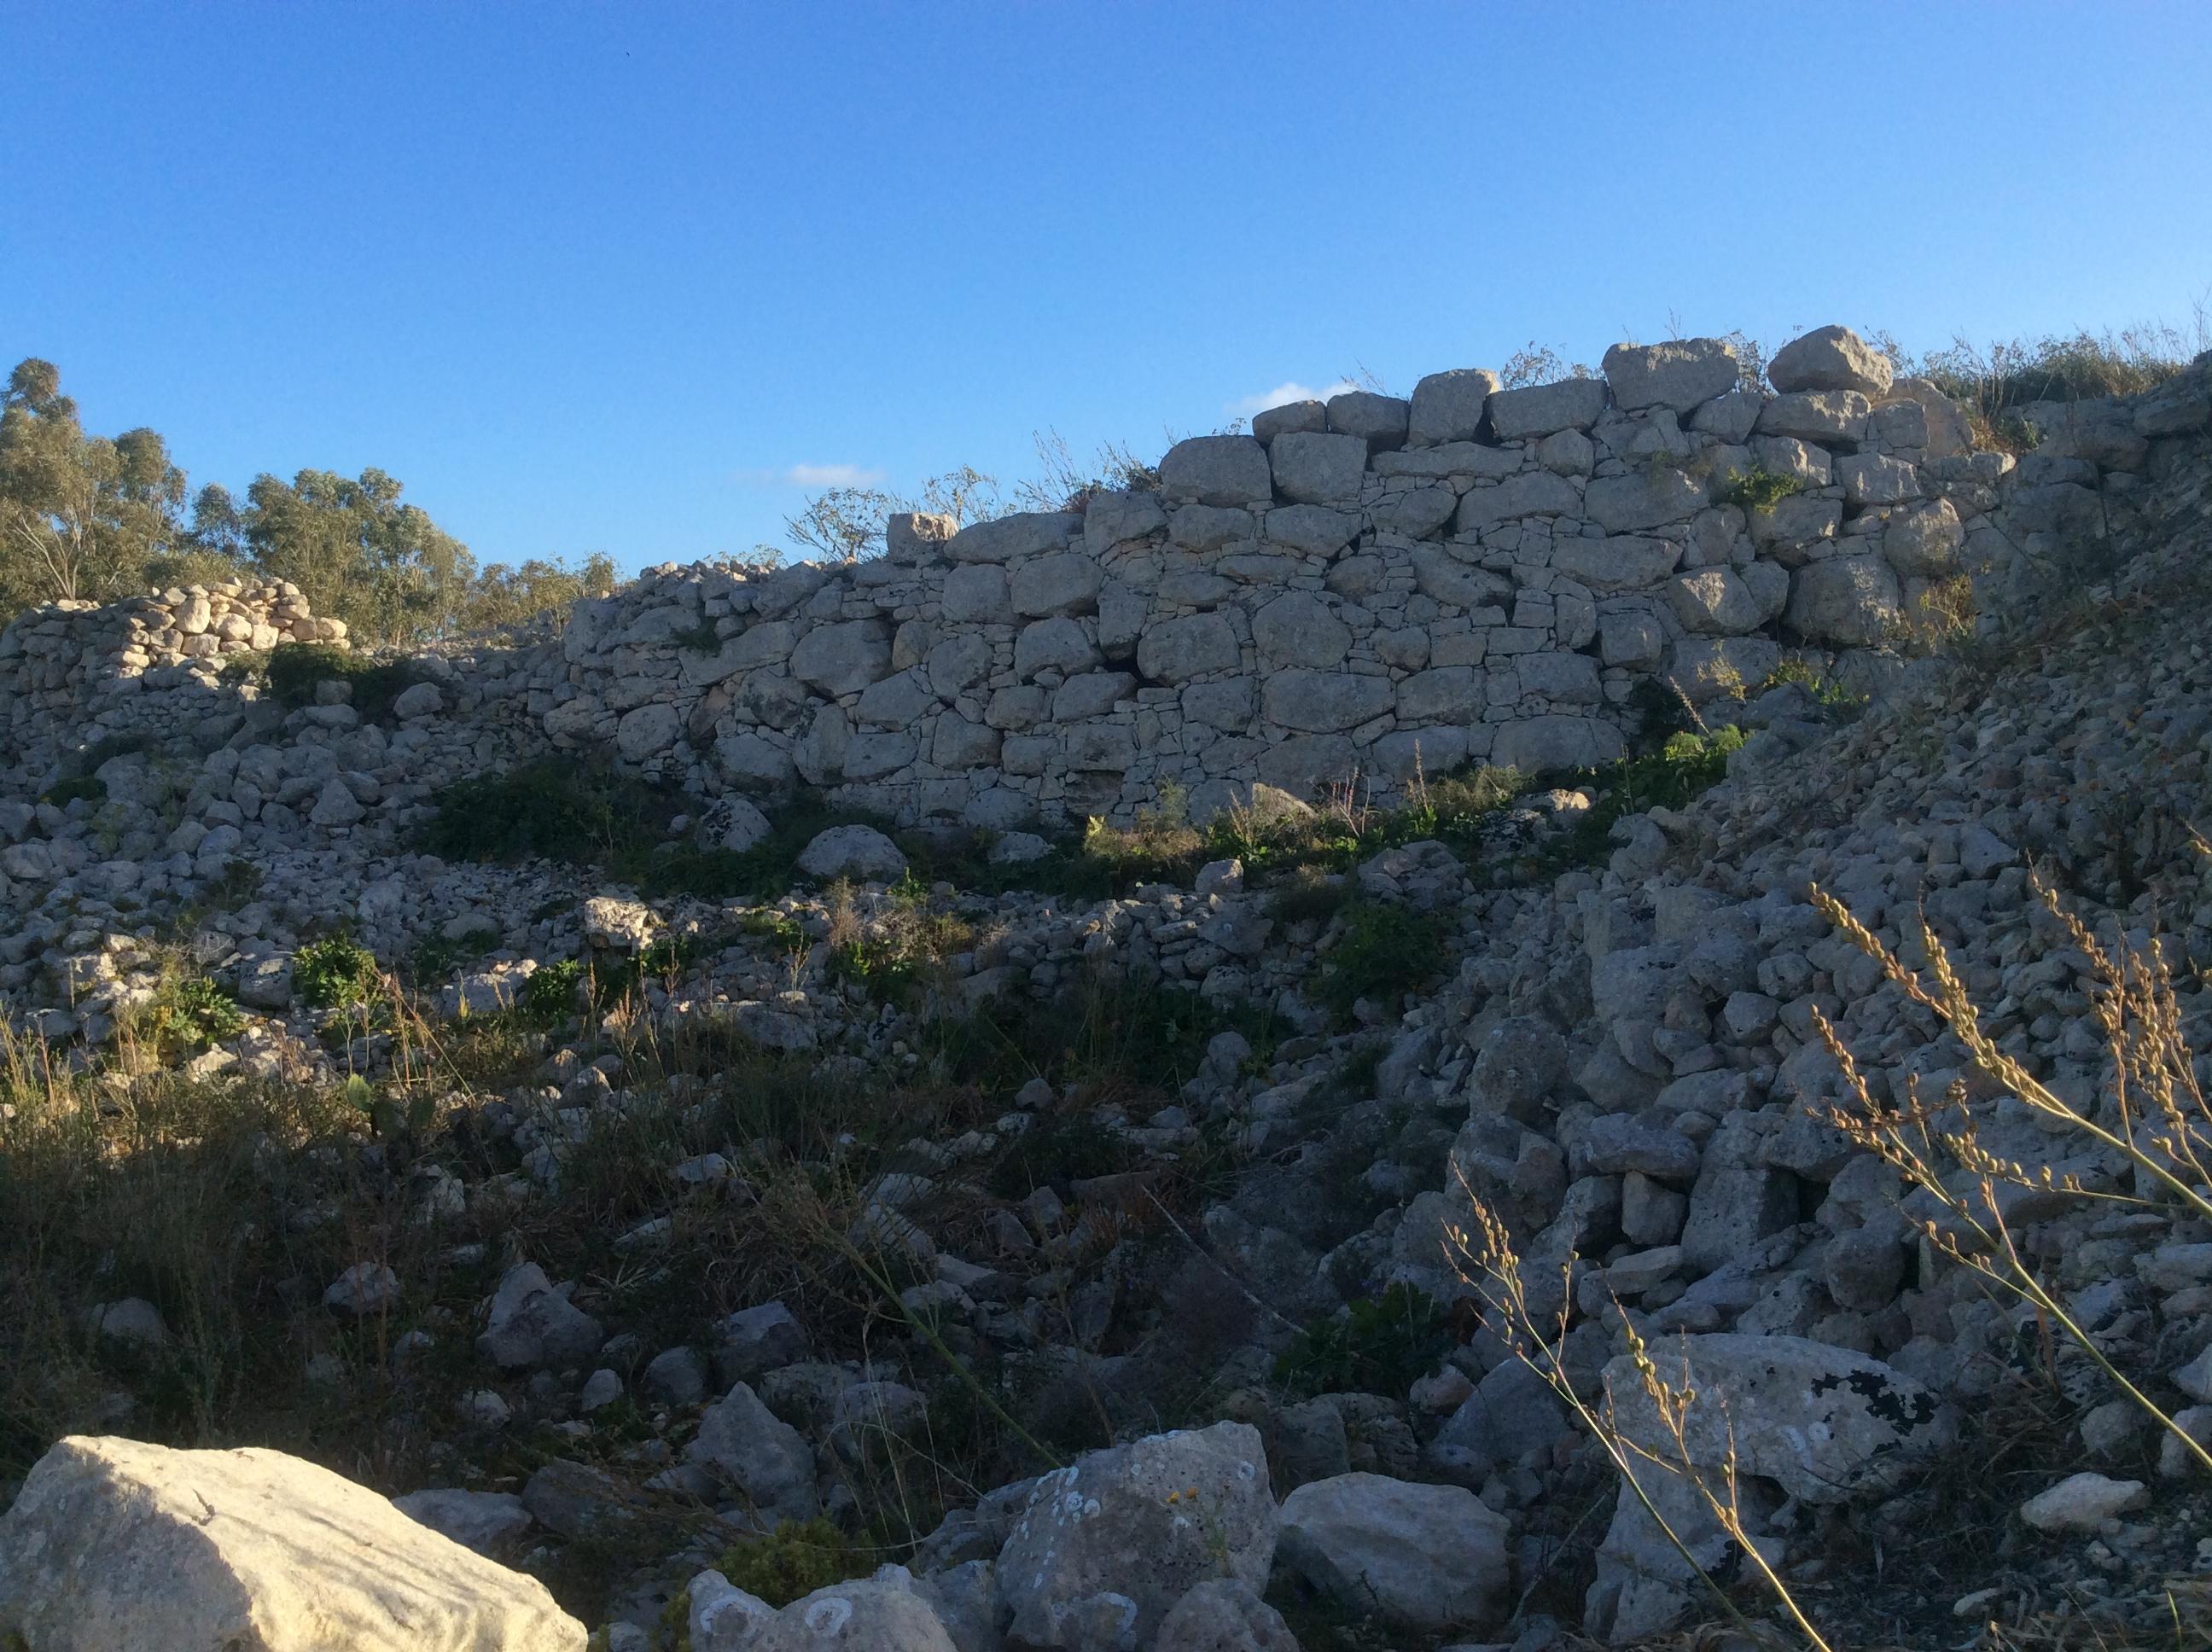 emainsofafortifiedvillage,orin-adur,alta.orin-adurisanotableexampleofronzege-fortifications.